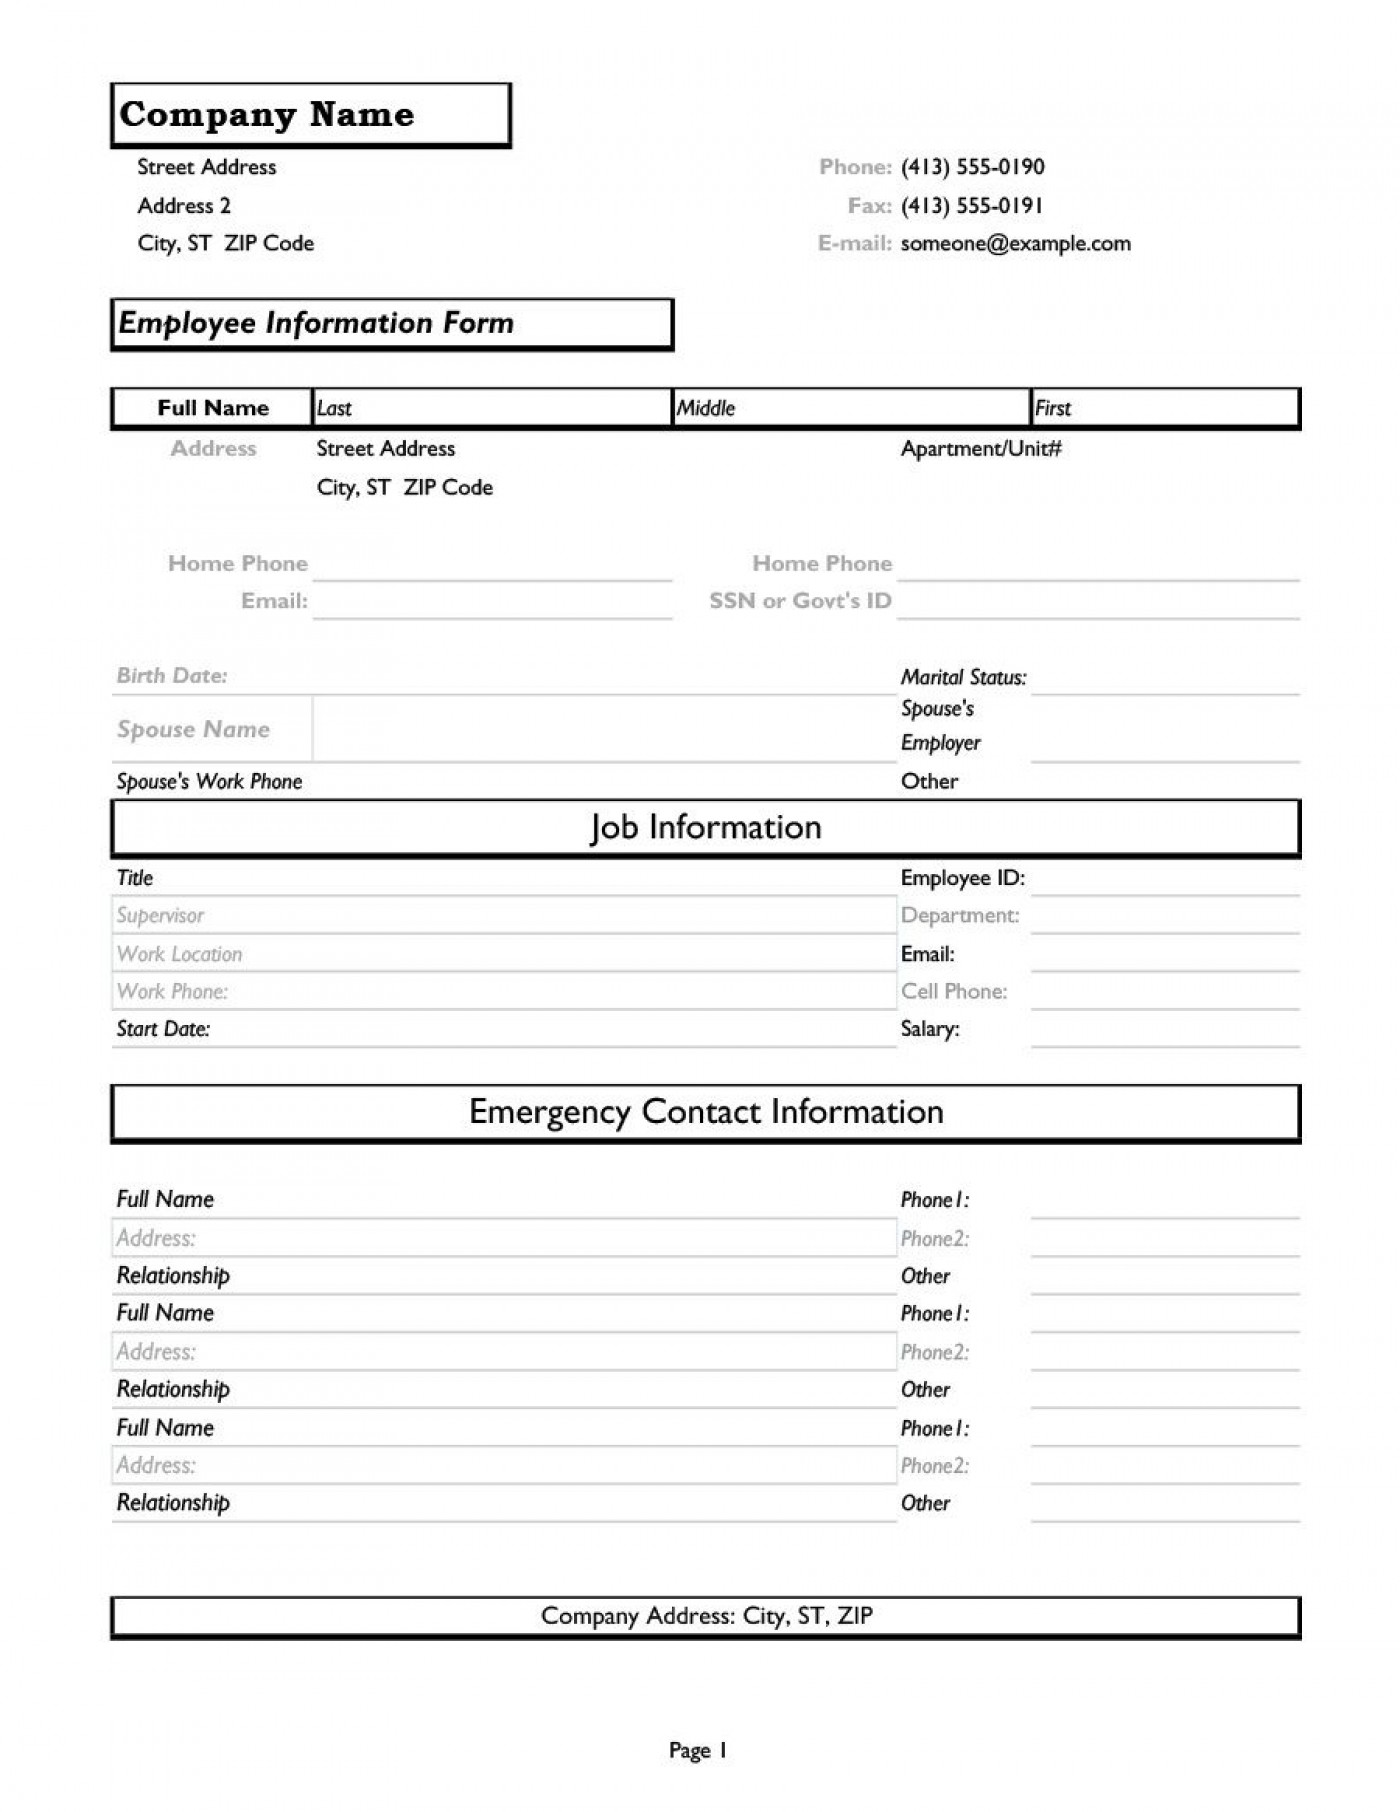 012 Unique Employee Personnel File Template Image  Checklist Request Form Release1400